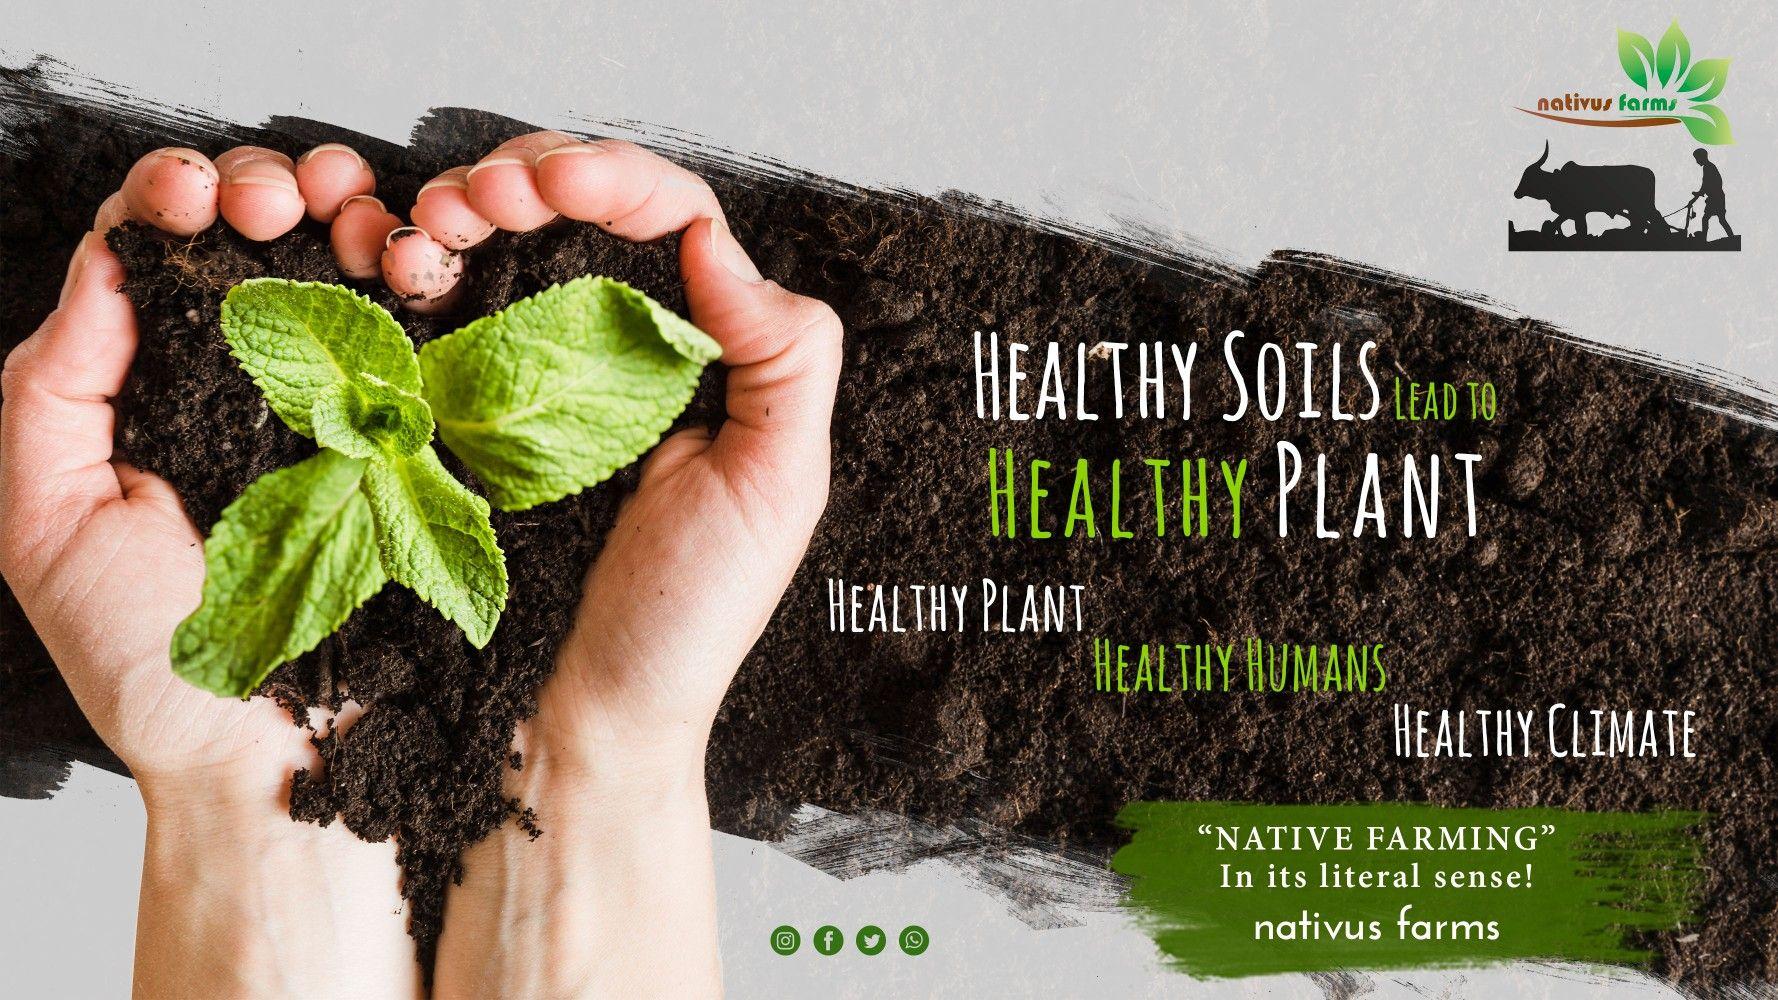 - Healthy Plants - Healthy Humans - Healthy Climate #nativusfarms #soils #soil #soilscience #agriculture #soilhealth #healthysoil #farming #livingsoil #land #planting #fertilizer #farmland #soilbiology #ground #stopsoilpollution #nature